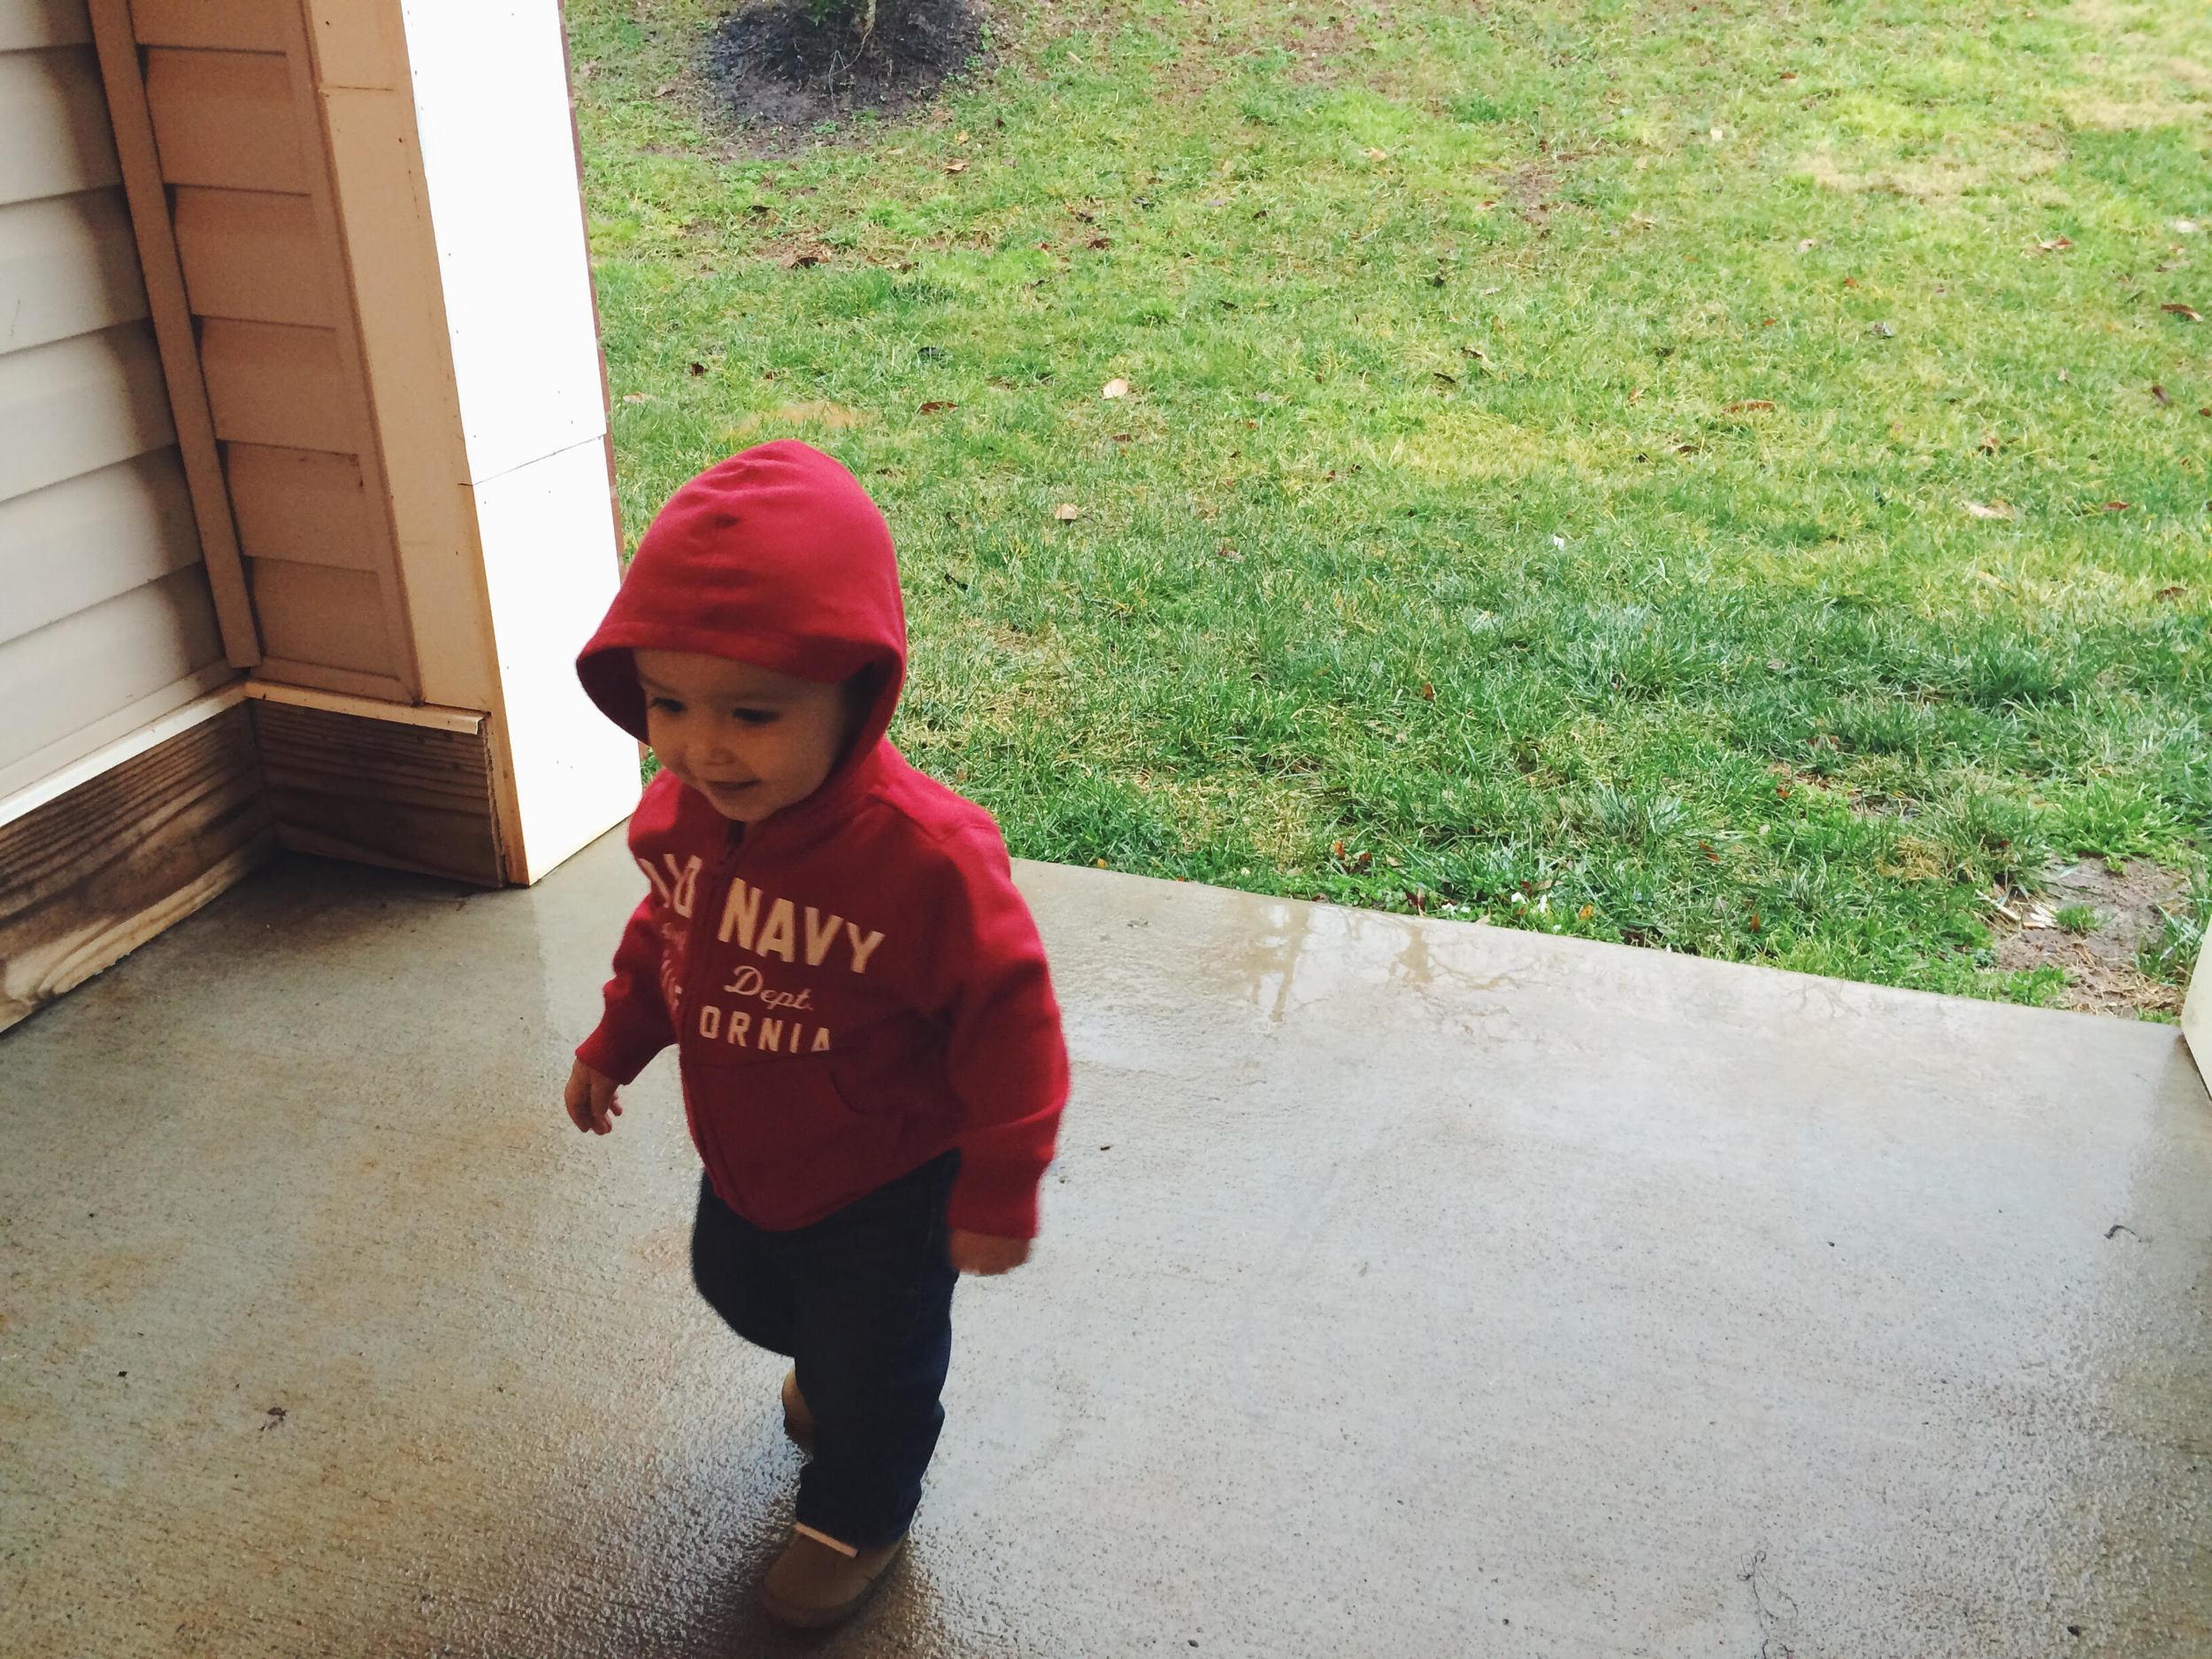 Declan, enjoying the rain with me today.